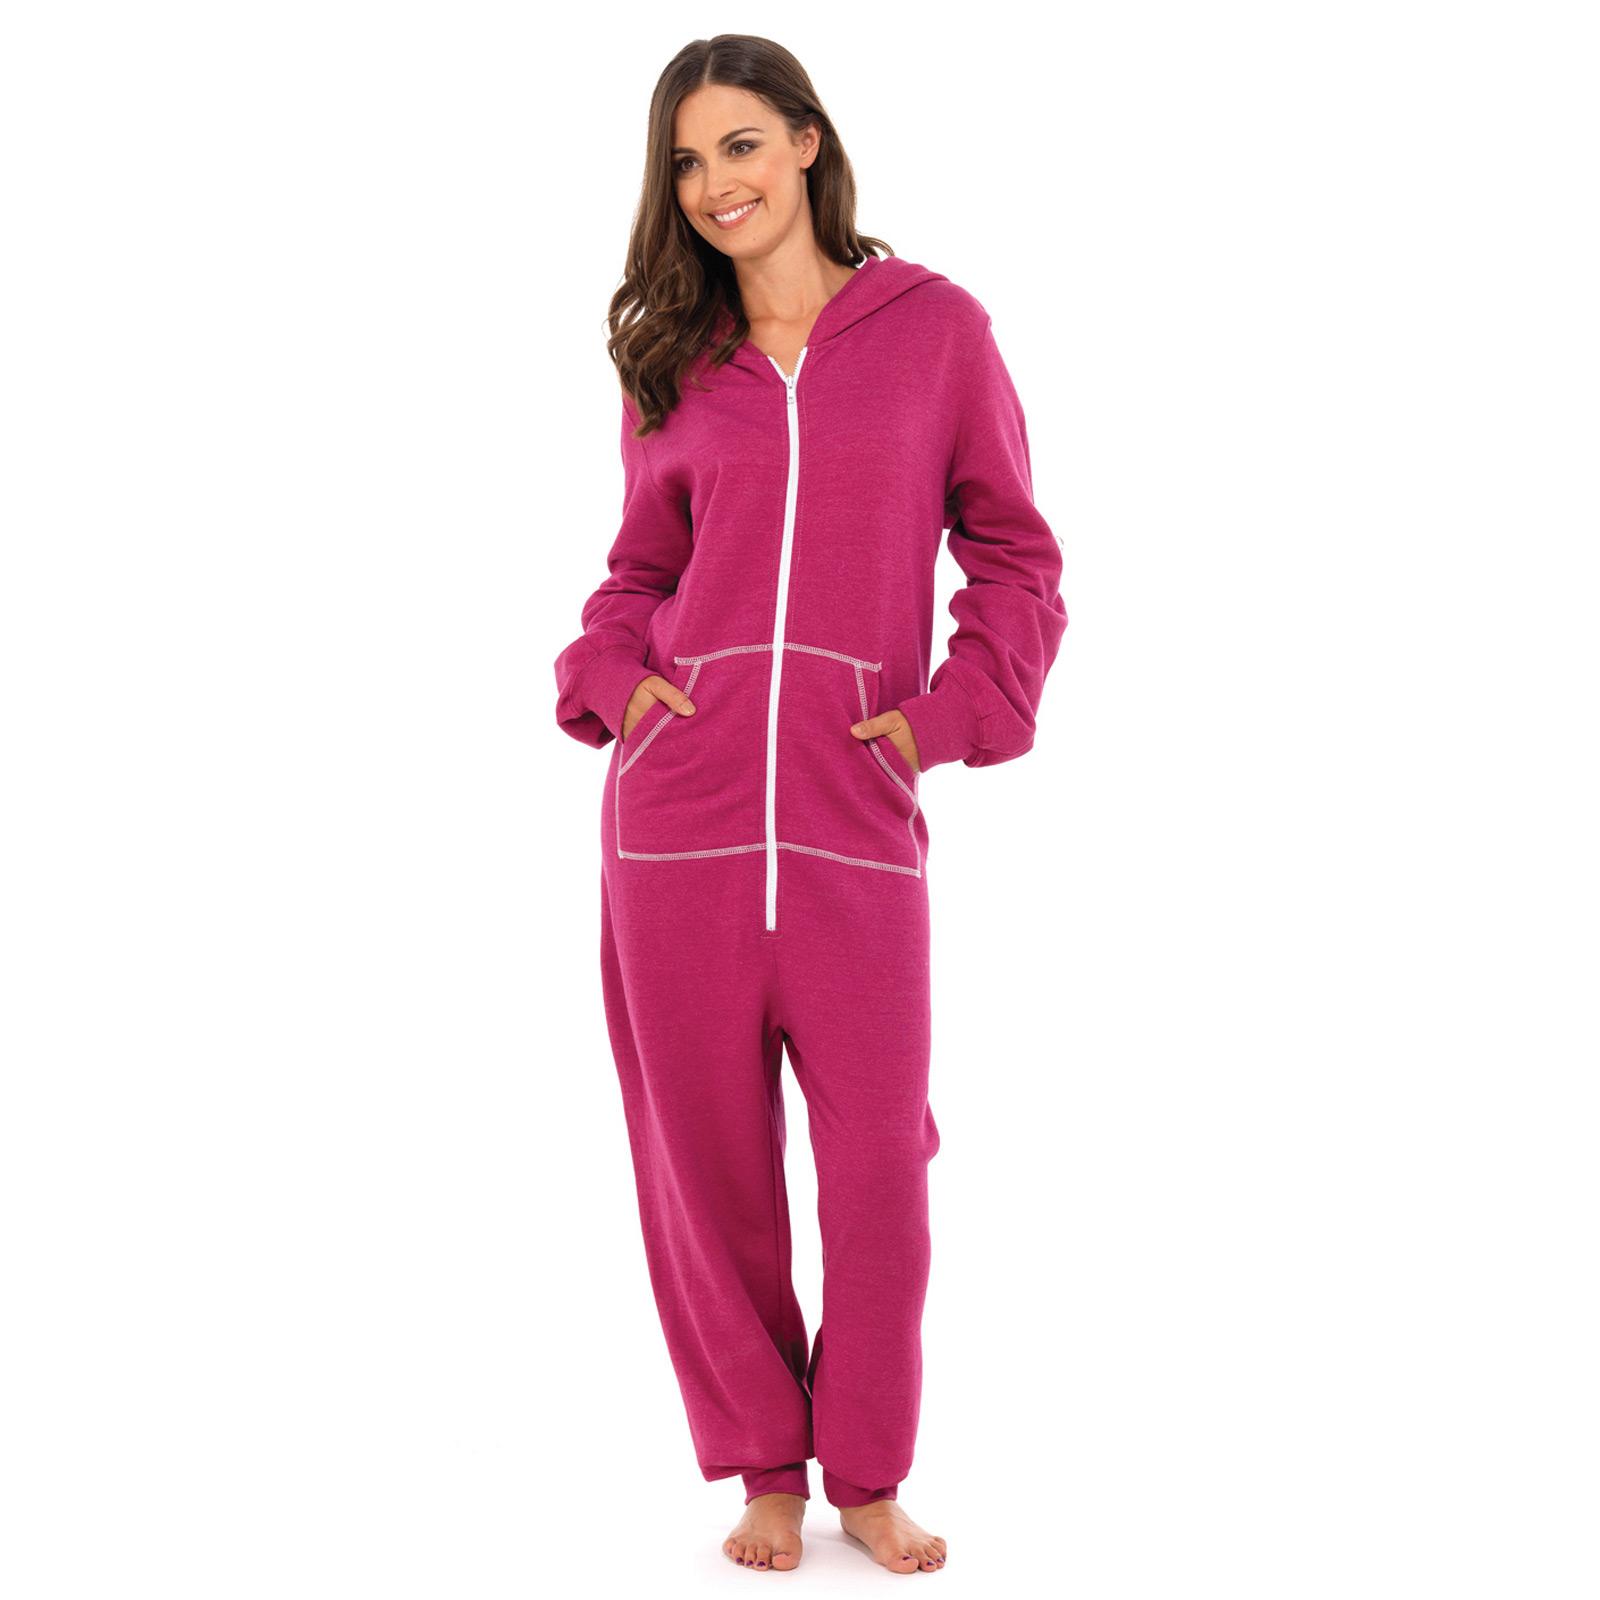 ladies all in one piece pyjama suit with hood sleep jump. Black Bedroom Furniture Sets. Home Design Ideas